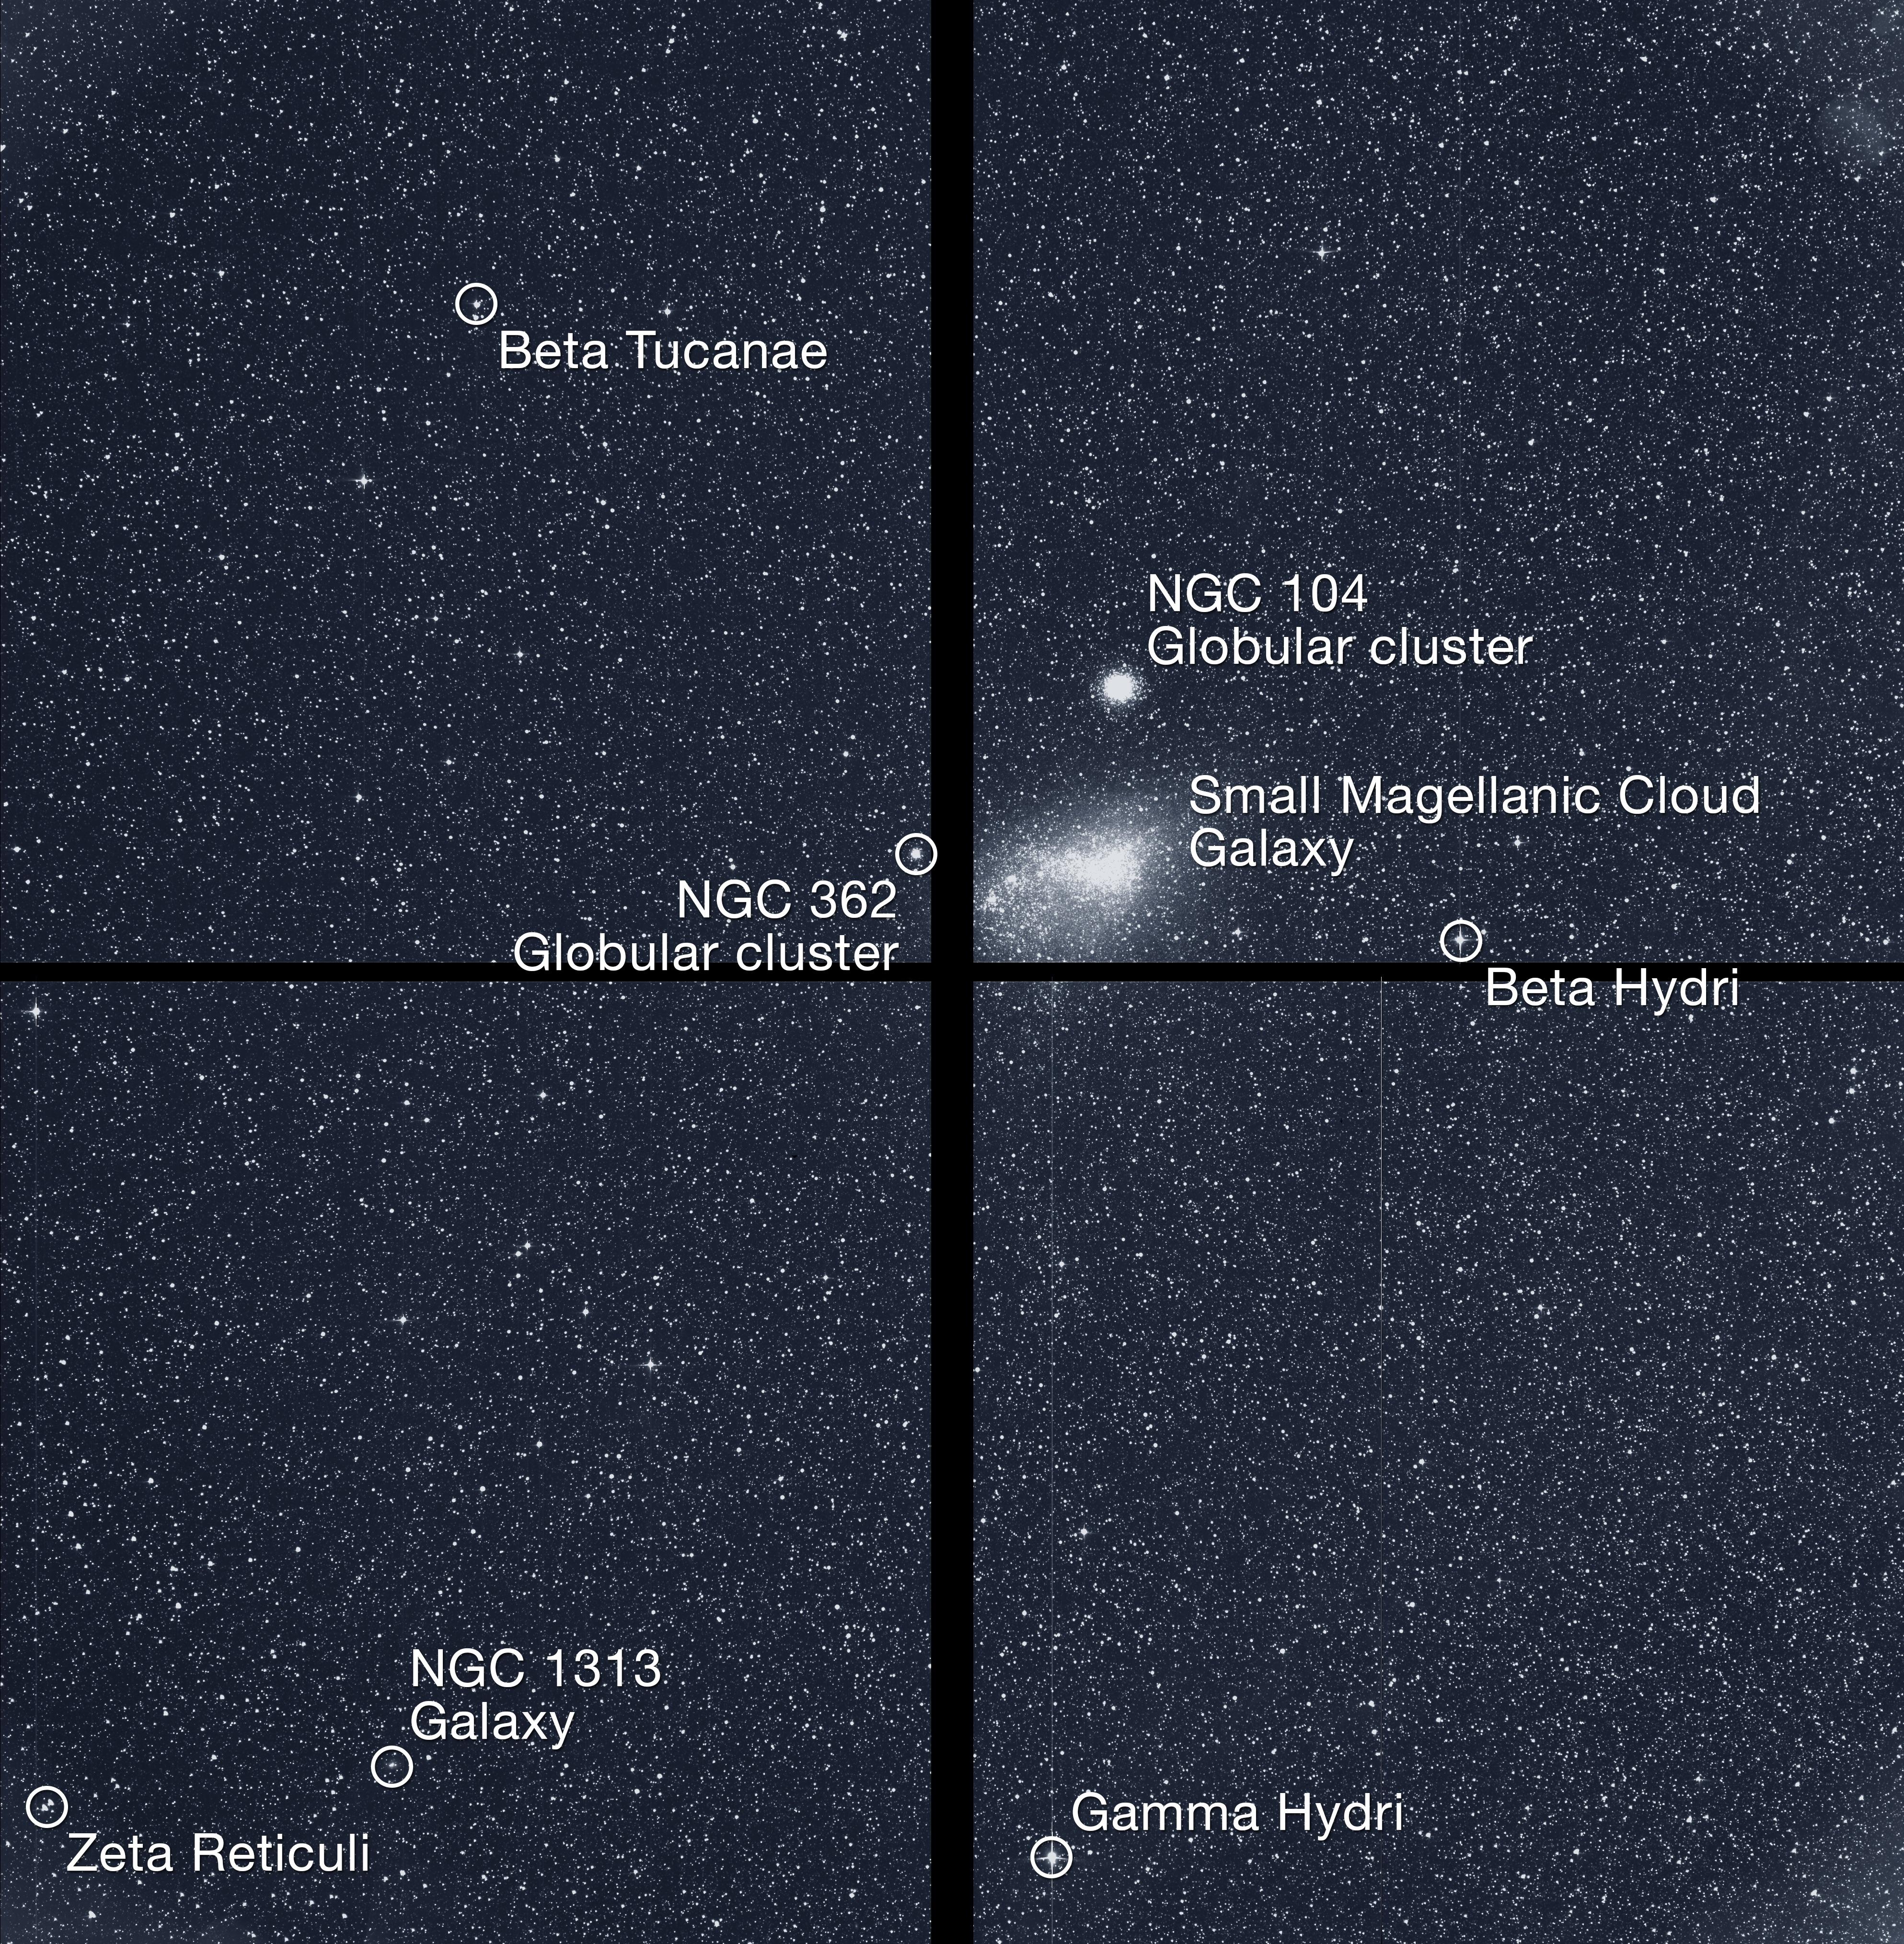 centauri dreams imagining and planning interstellar - HD3973×4056